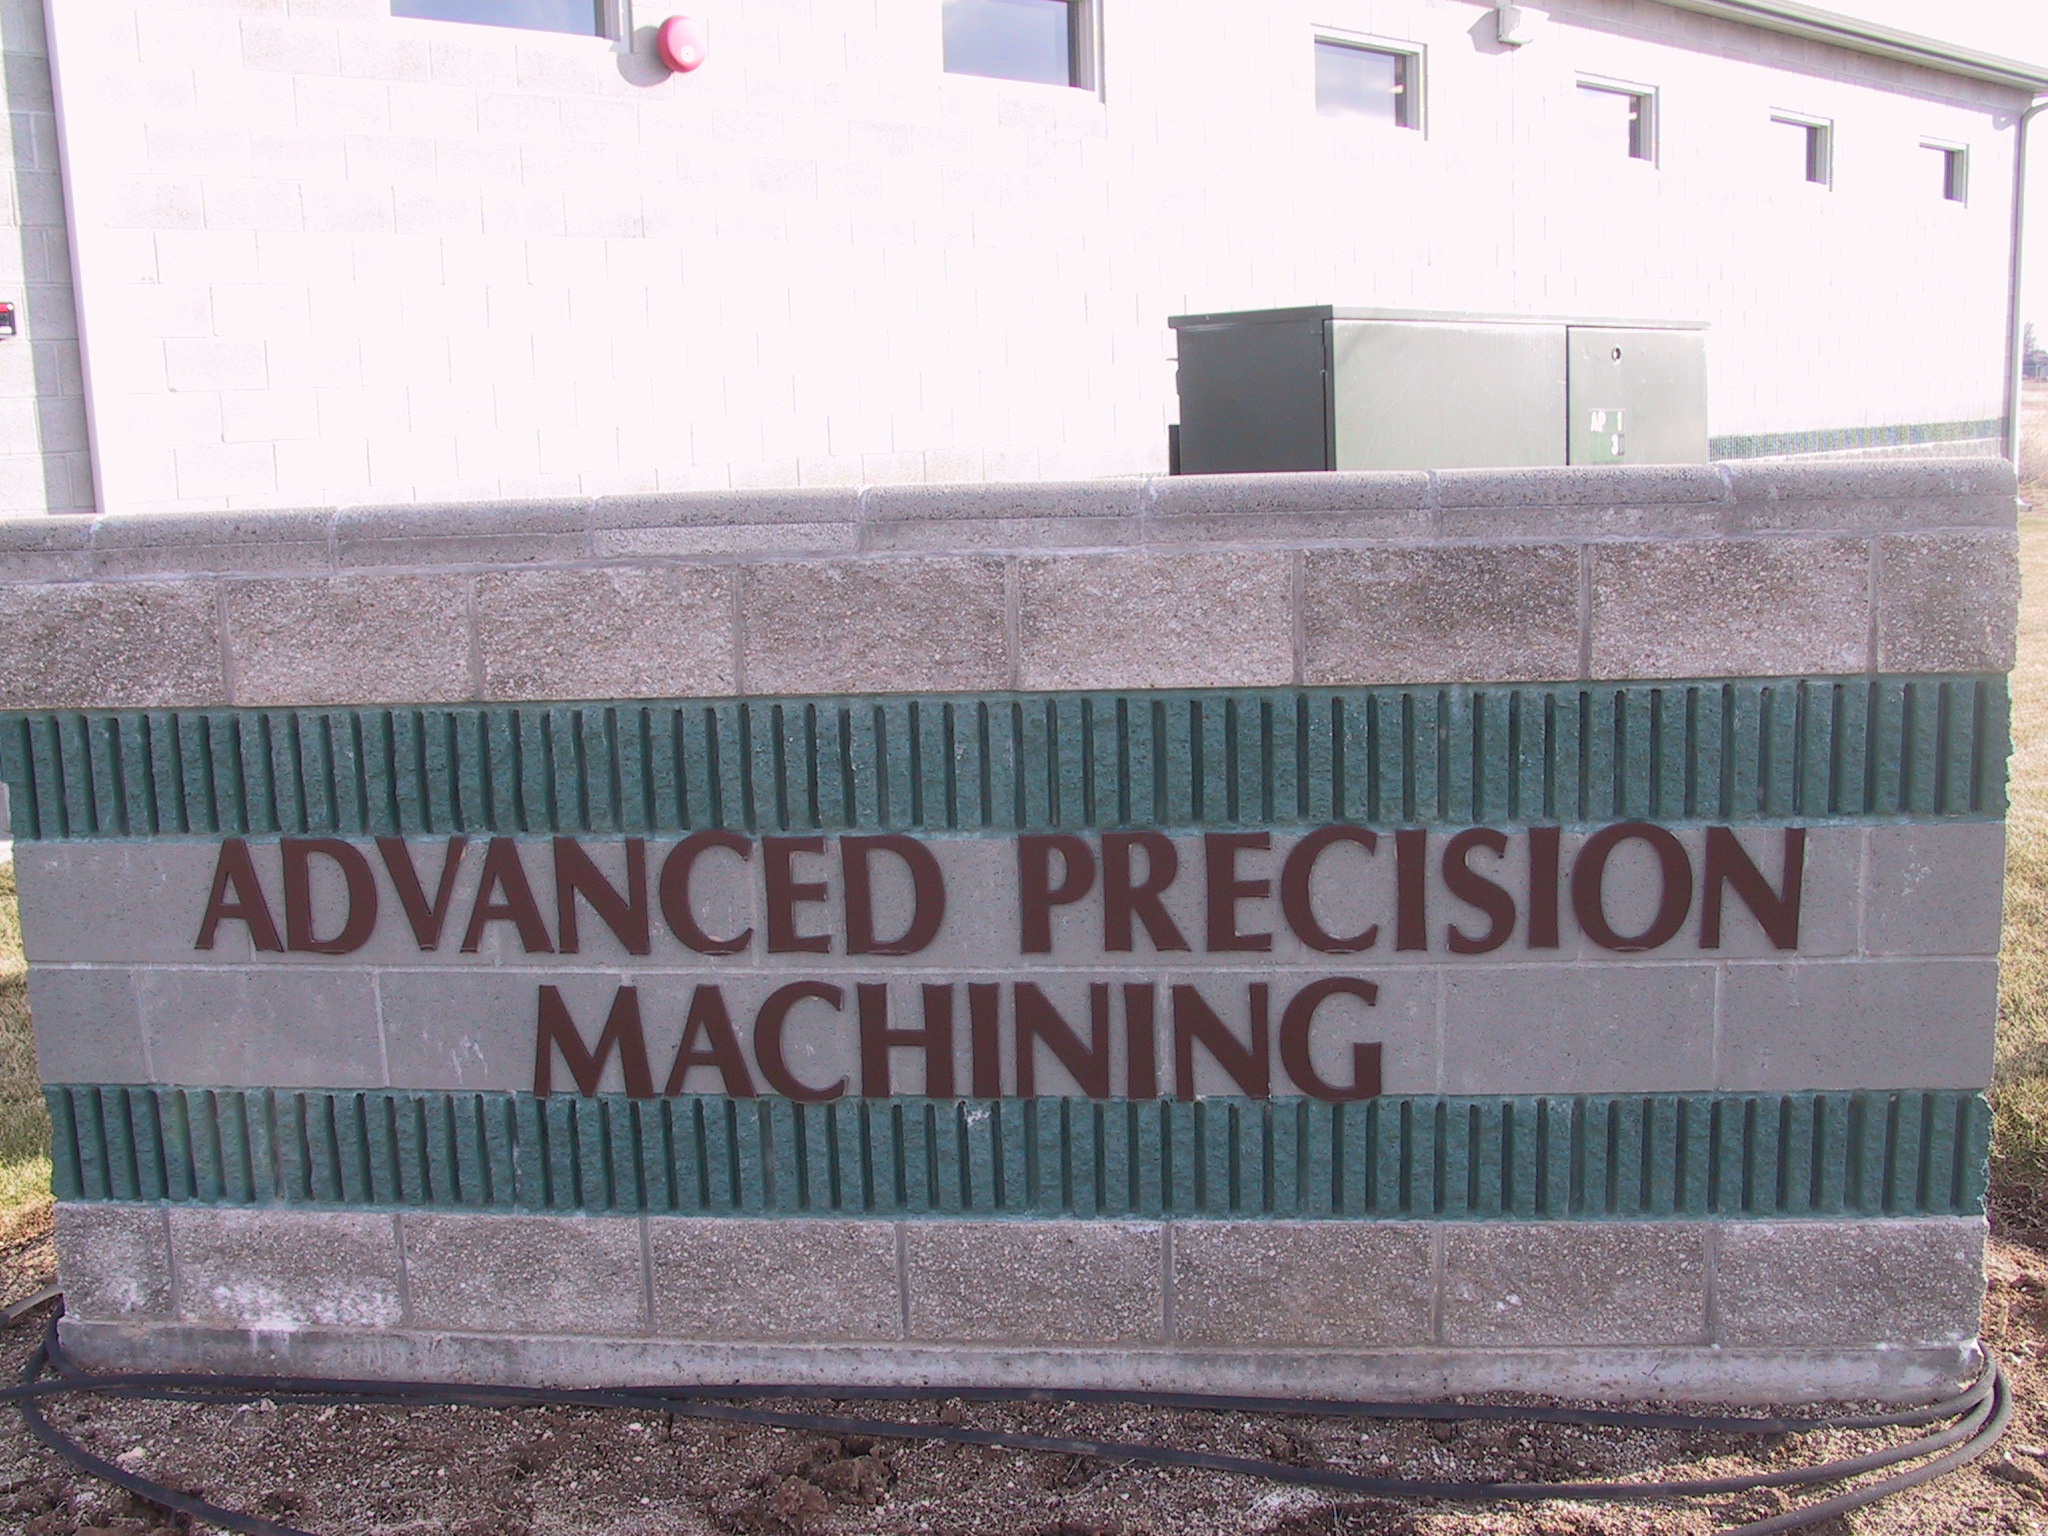 Advanced Precision Machining image 2